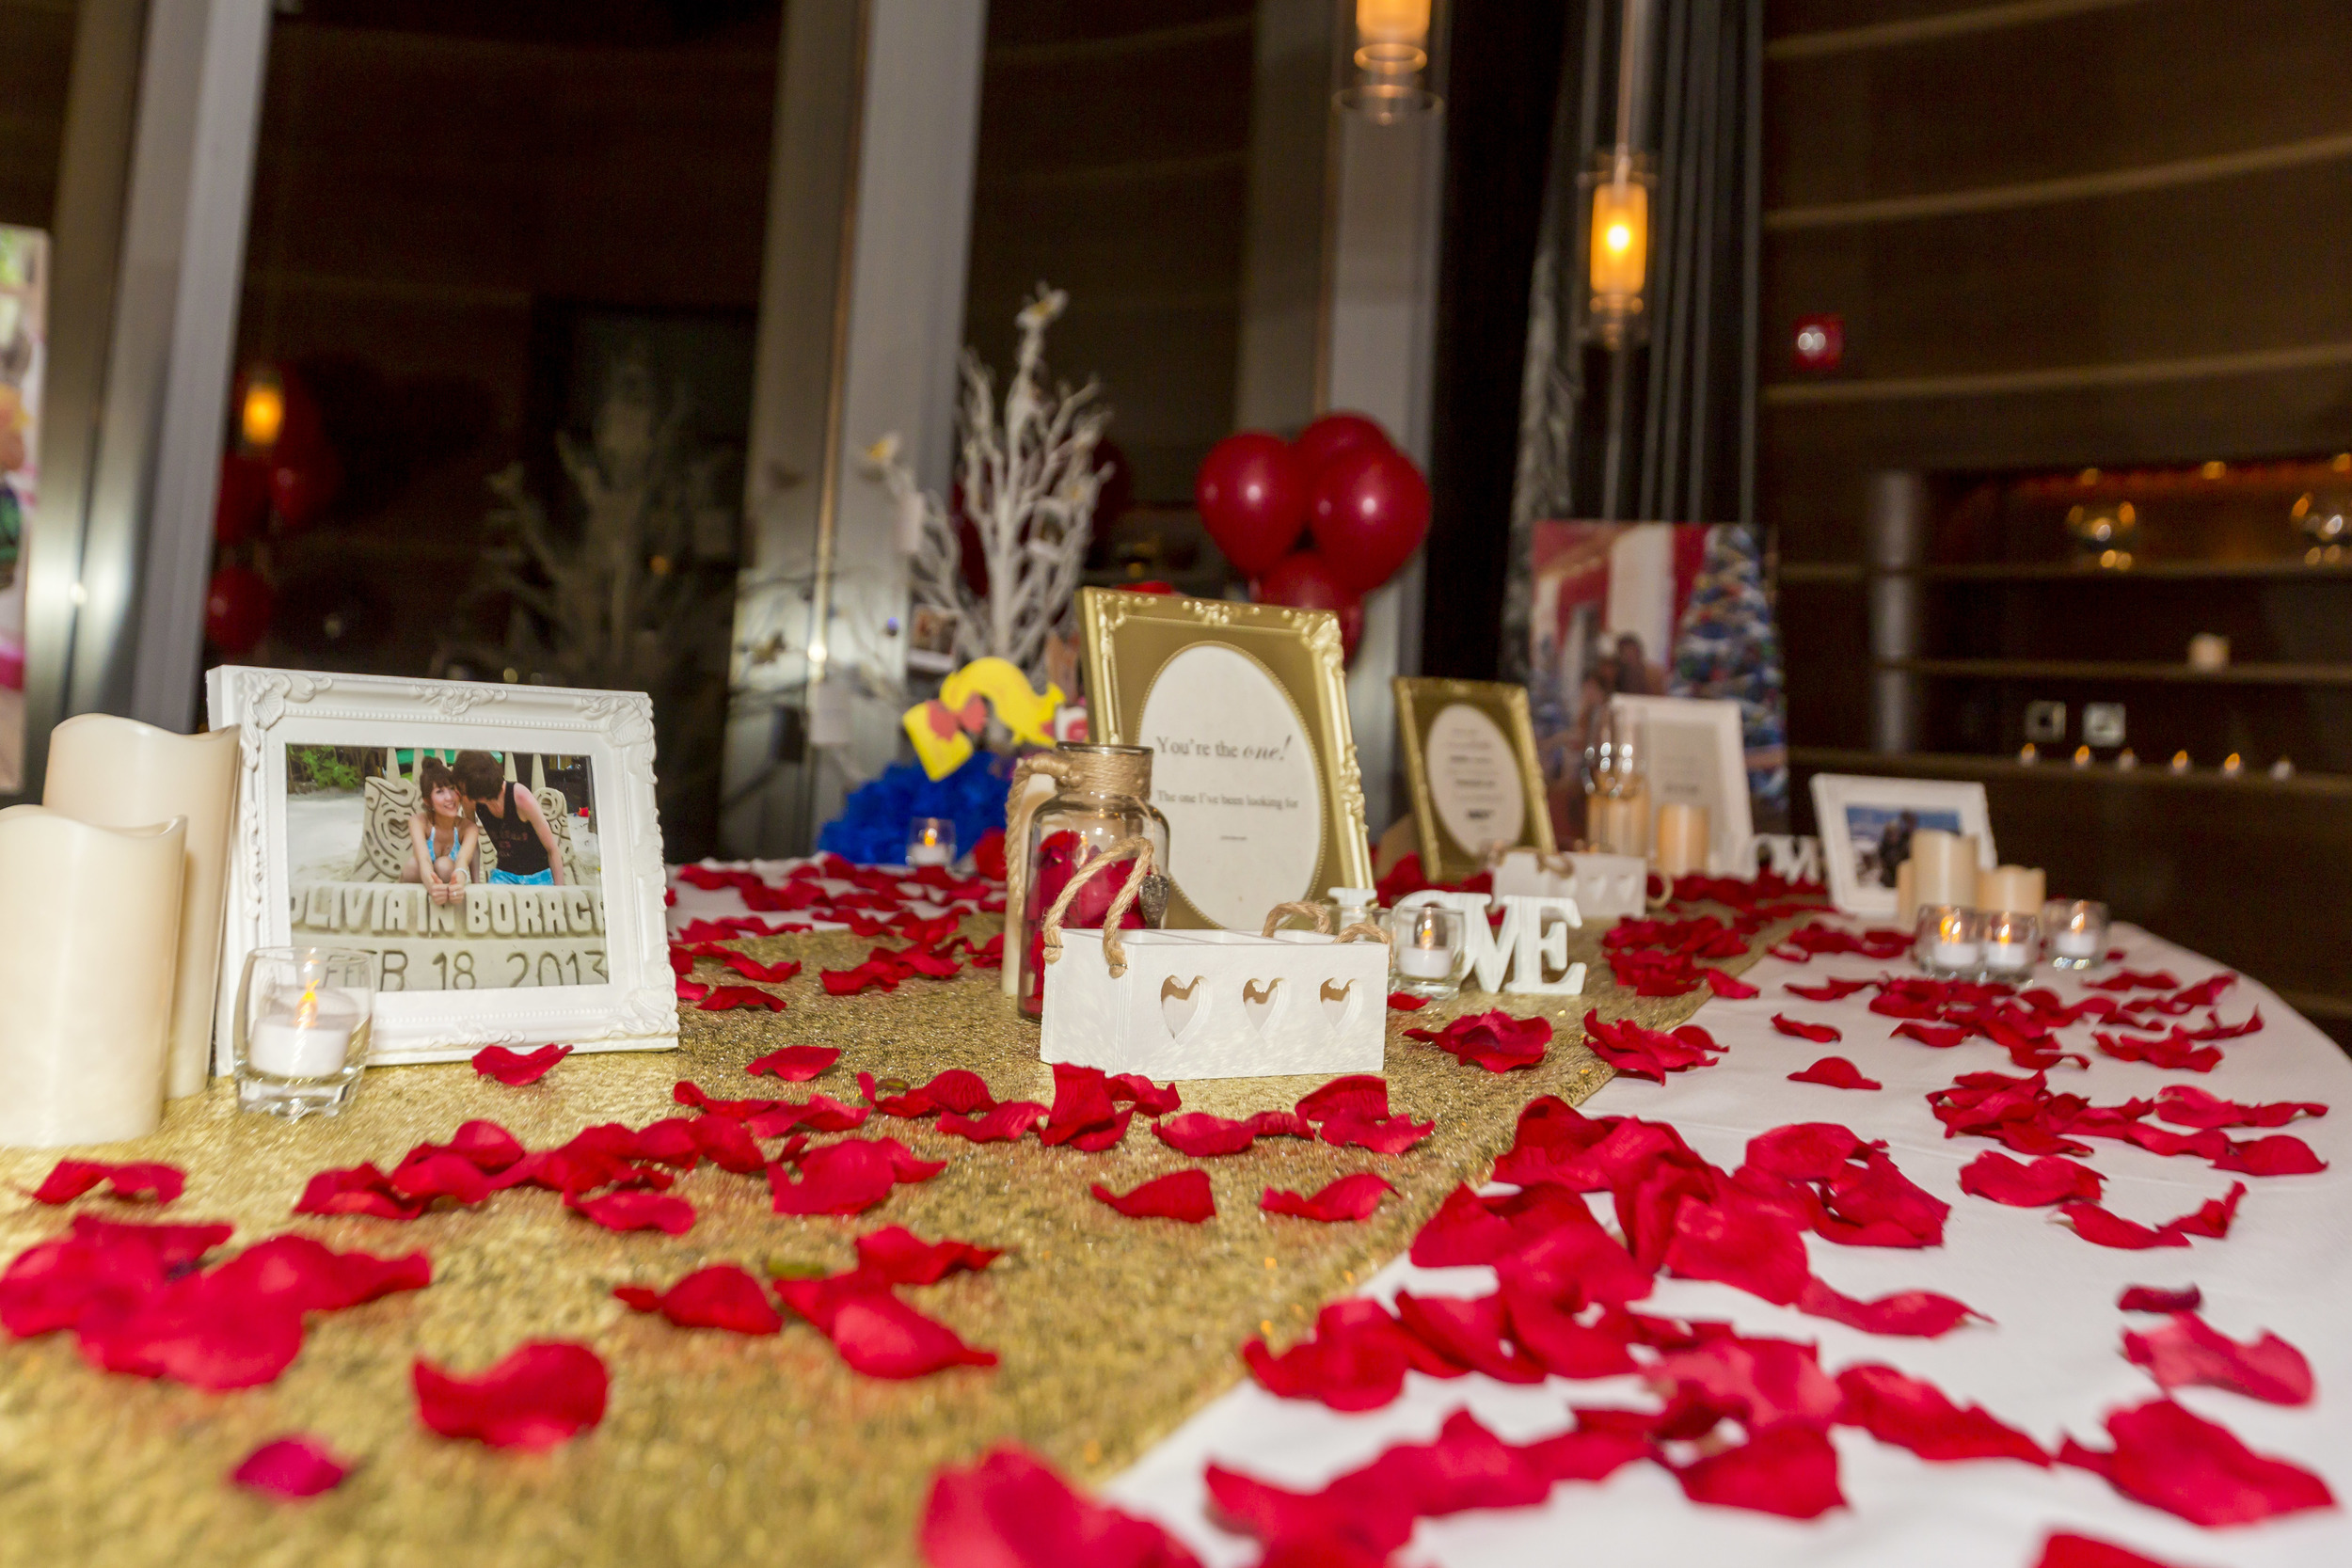 Our romantic table setup